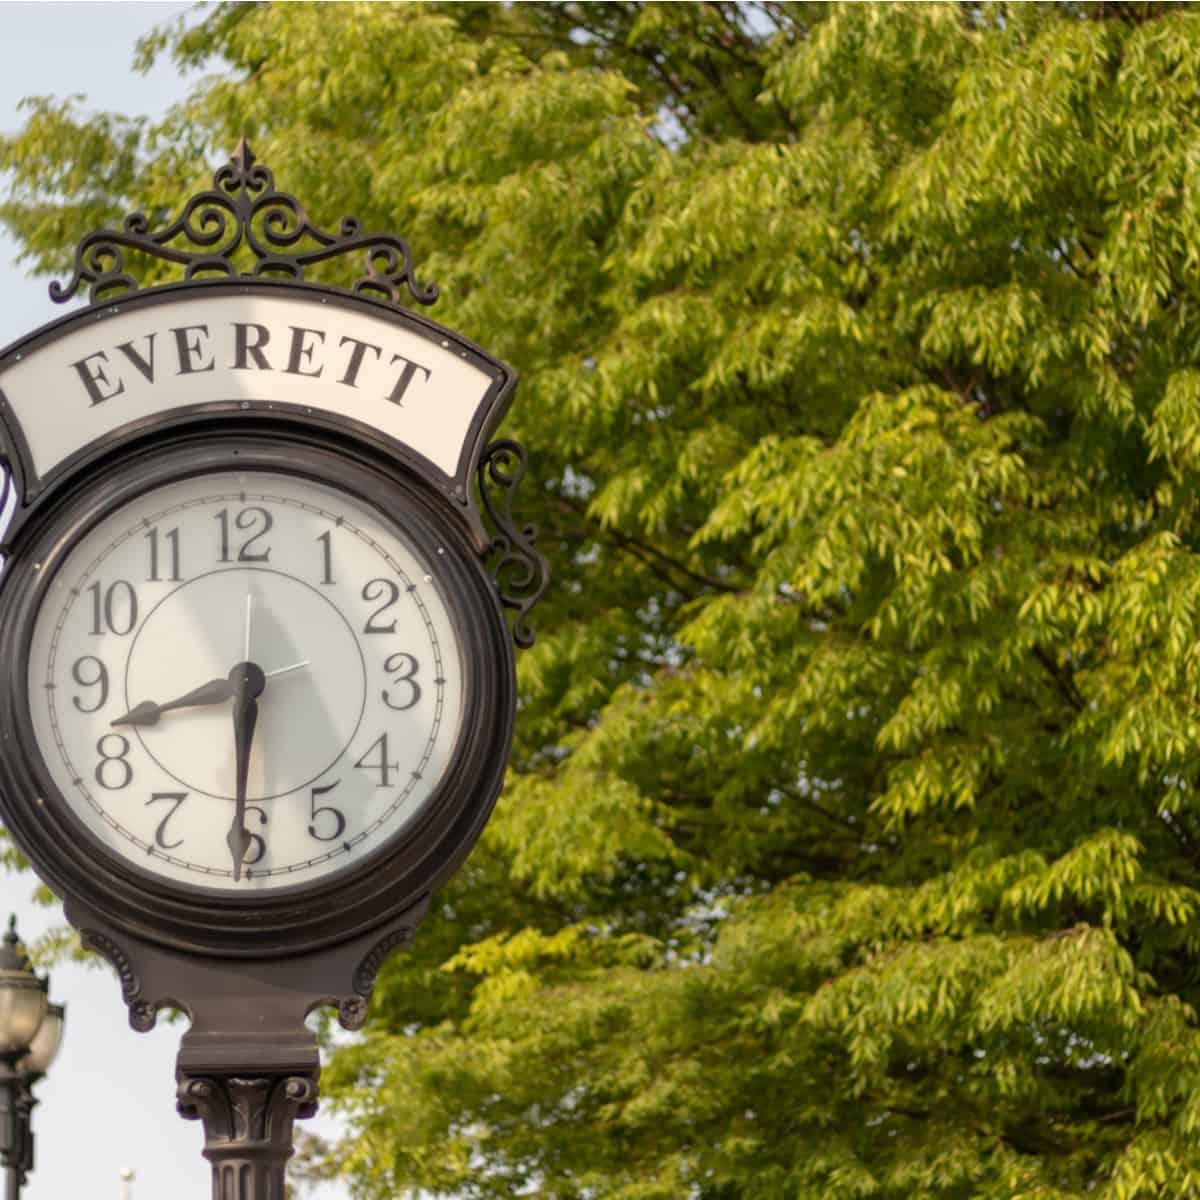 Big Clock with name Everett